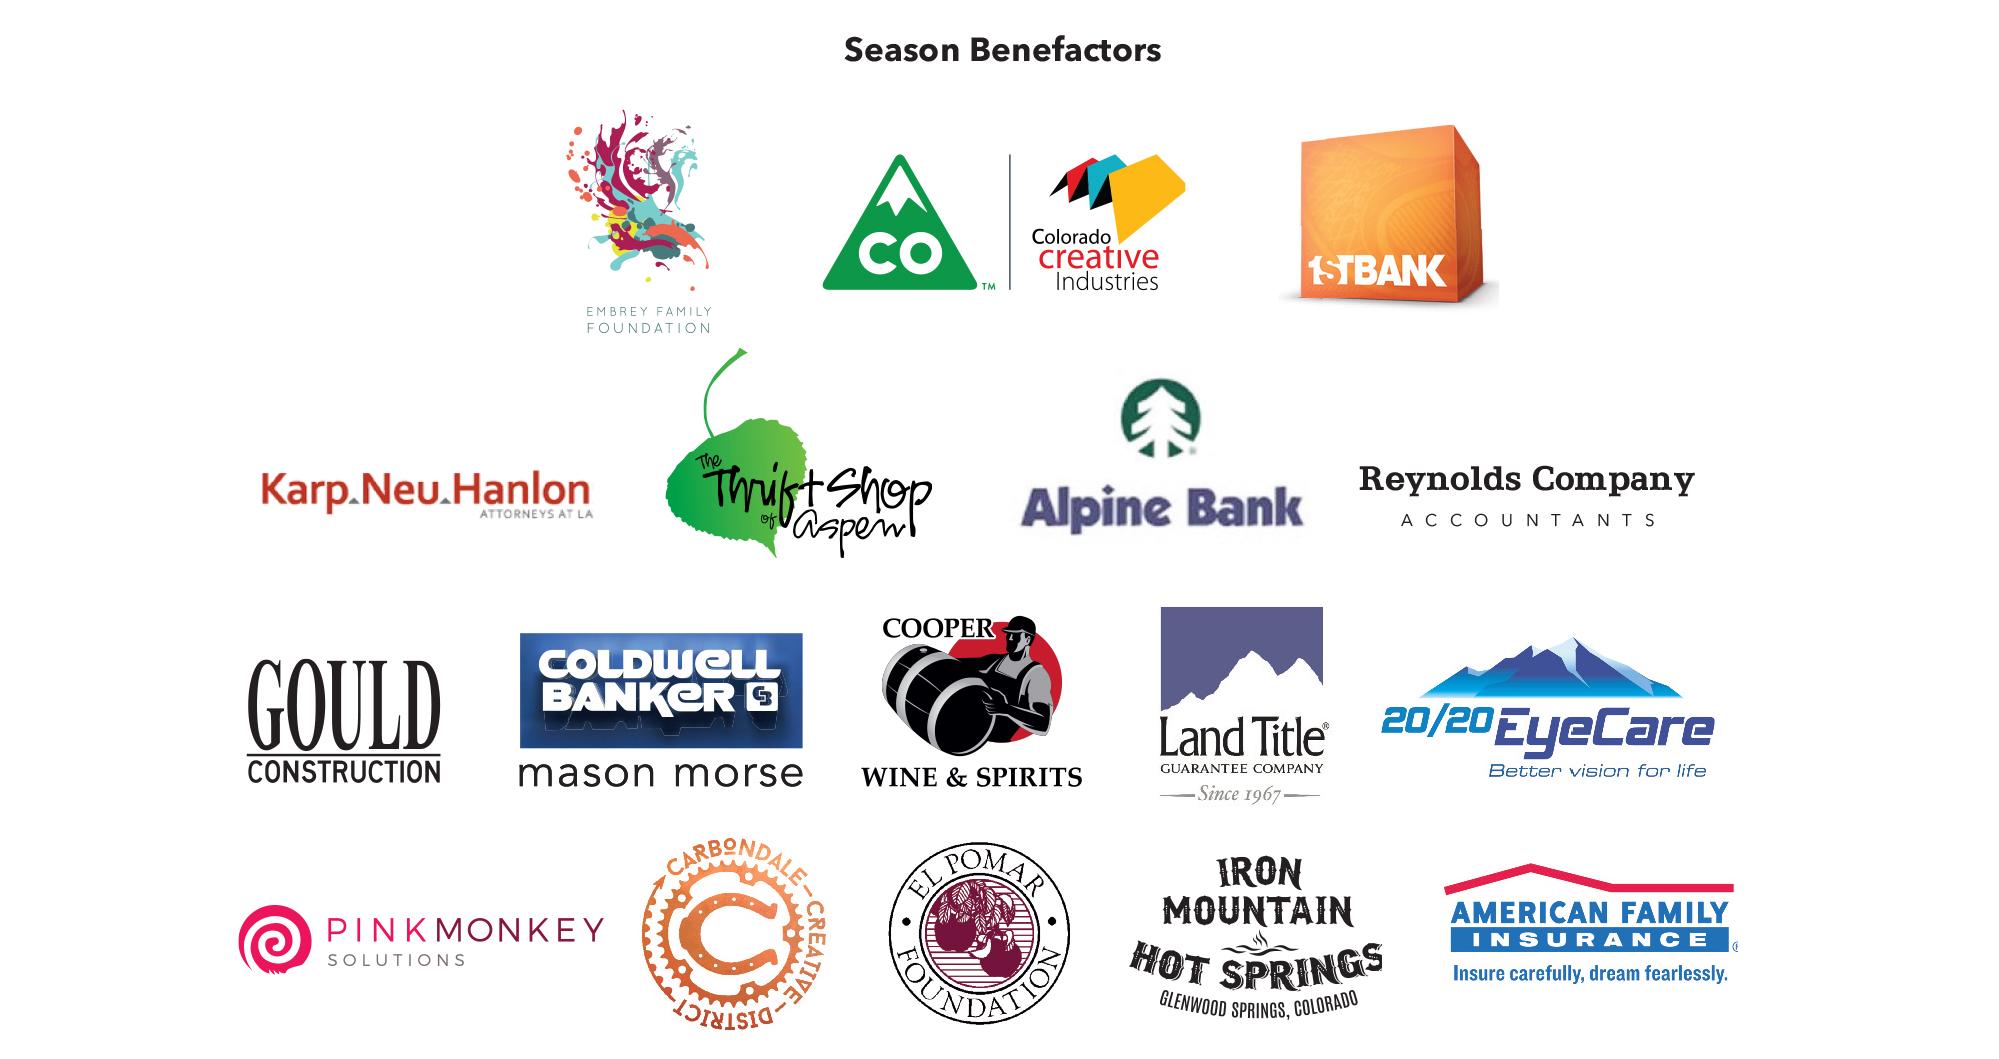 TRTC Sponsors